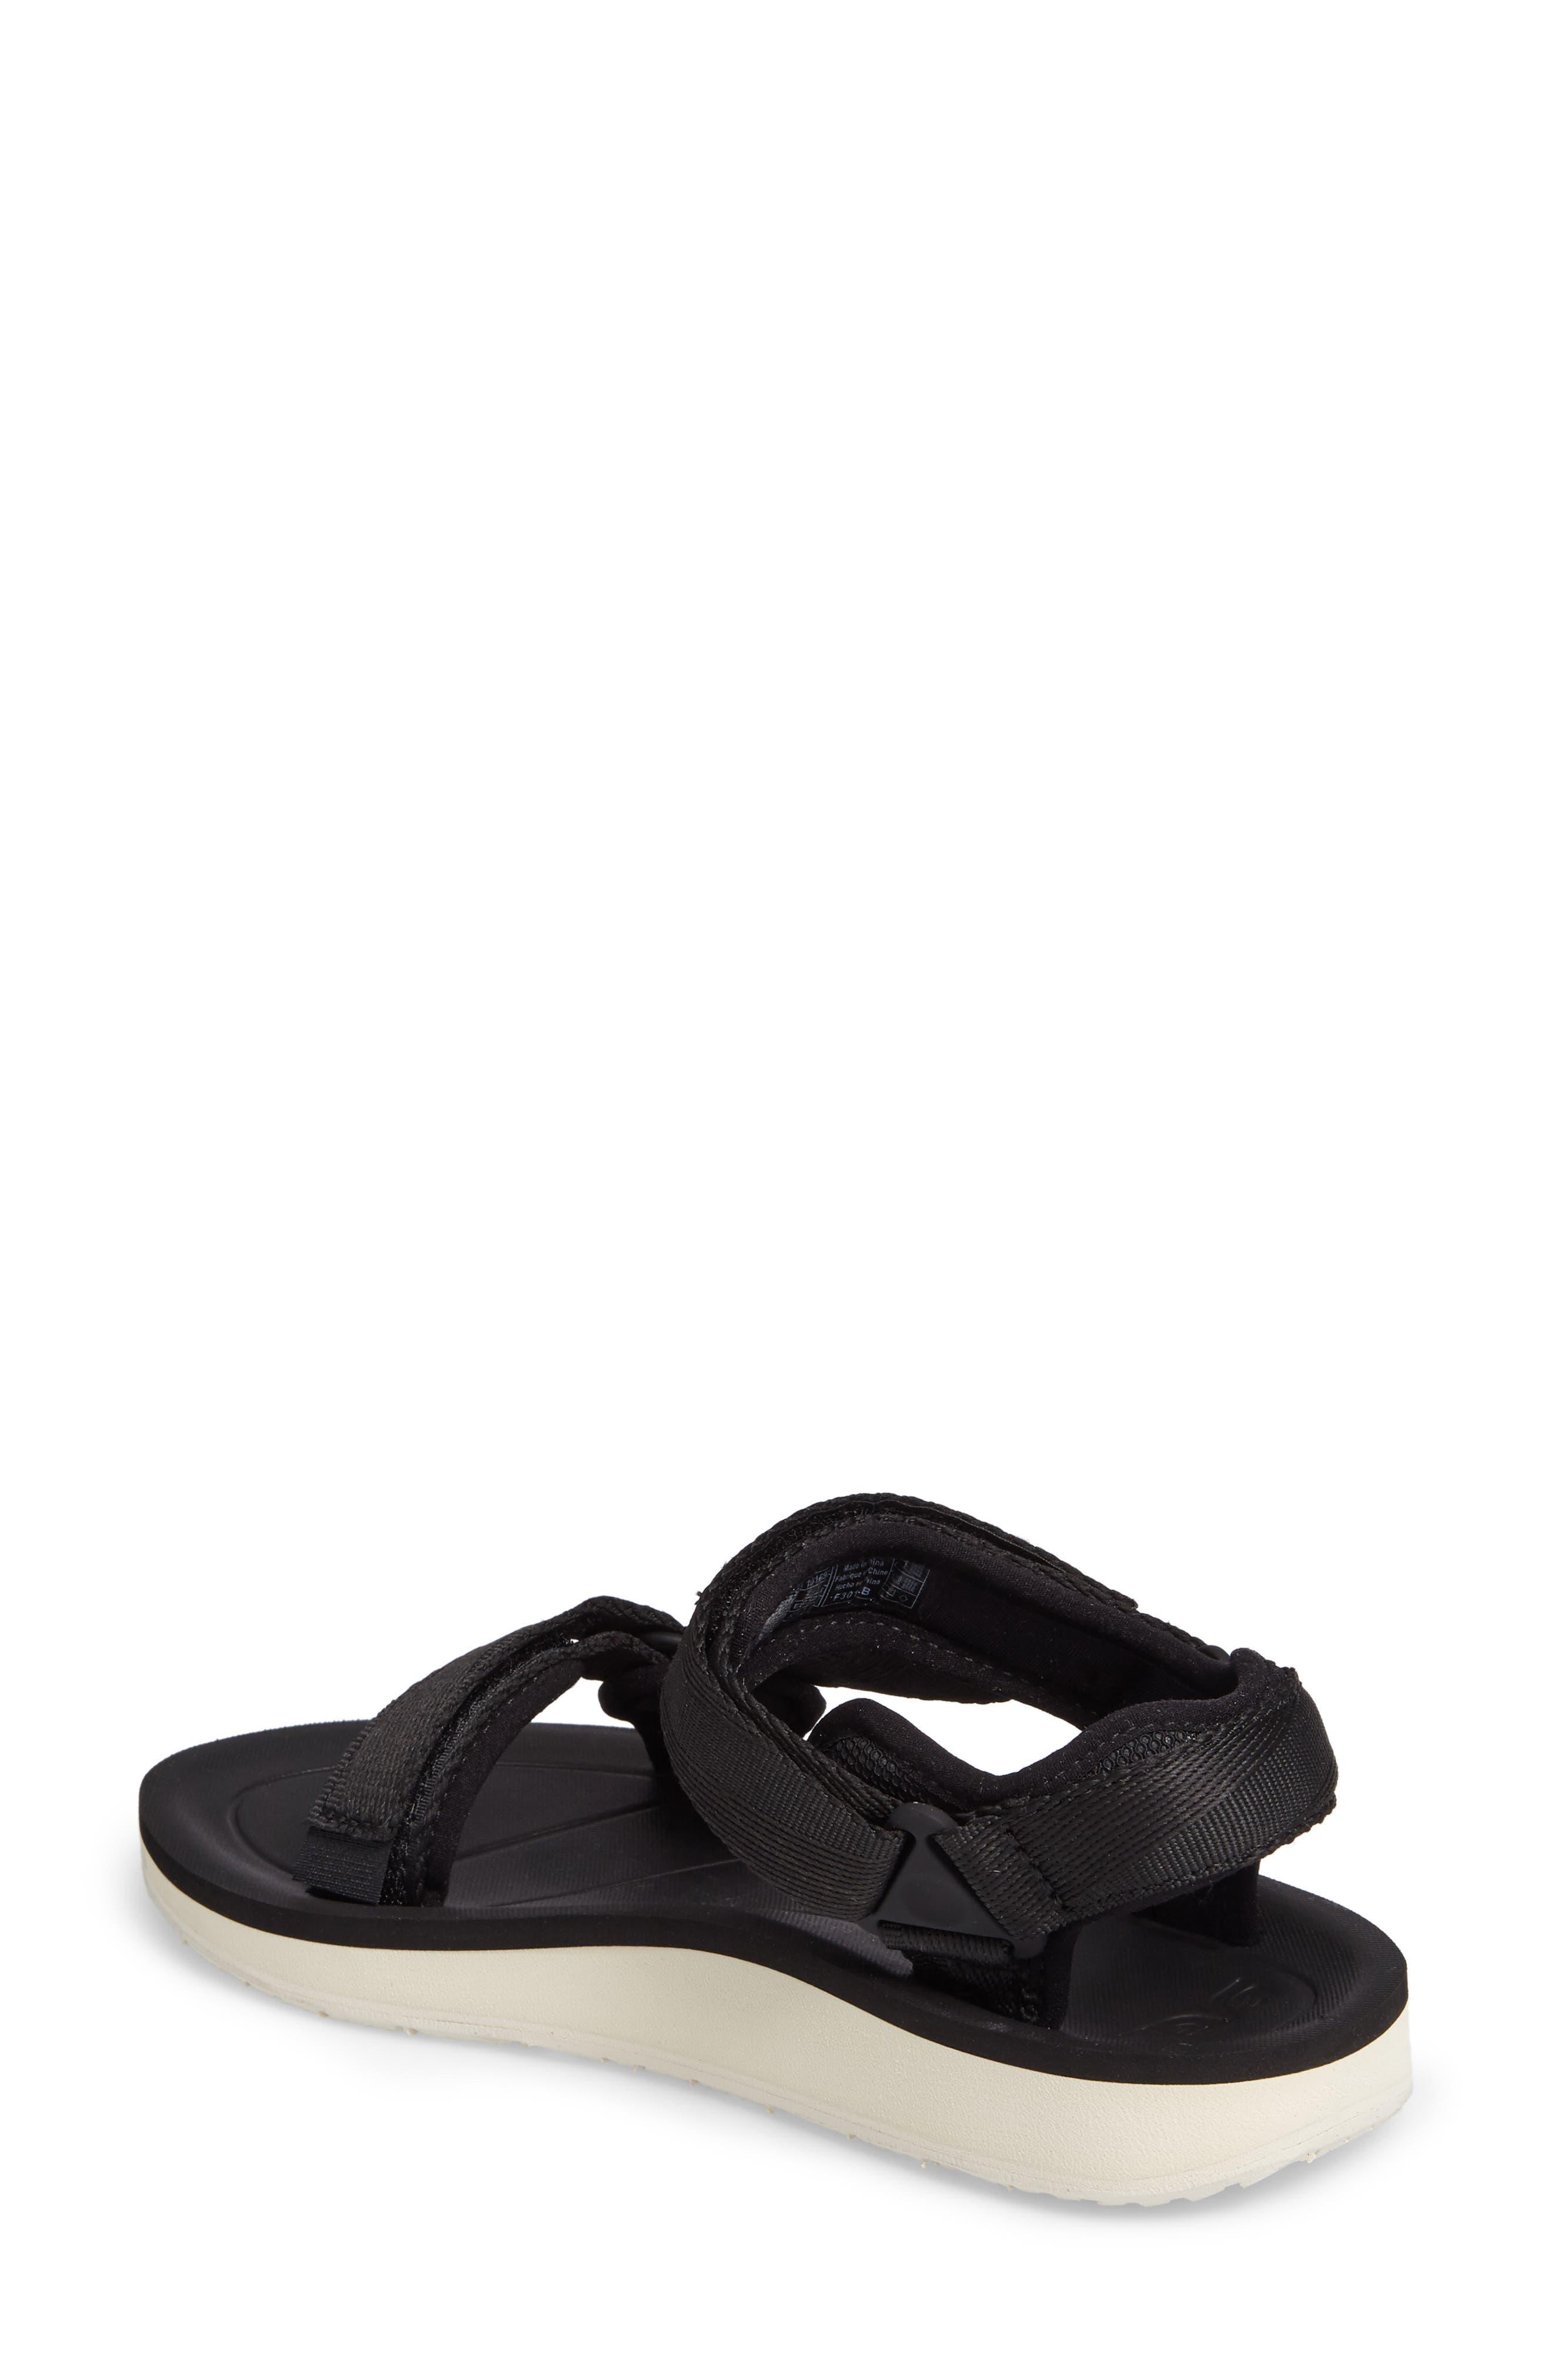 Women's zirra sandals - Women's Zirra Sandals 51